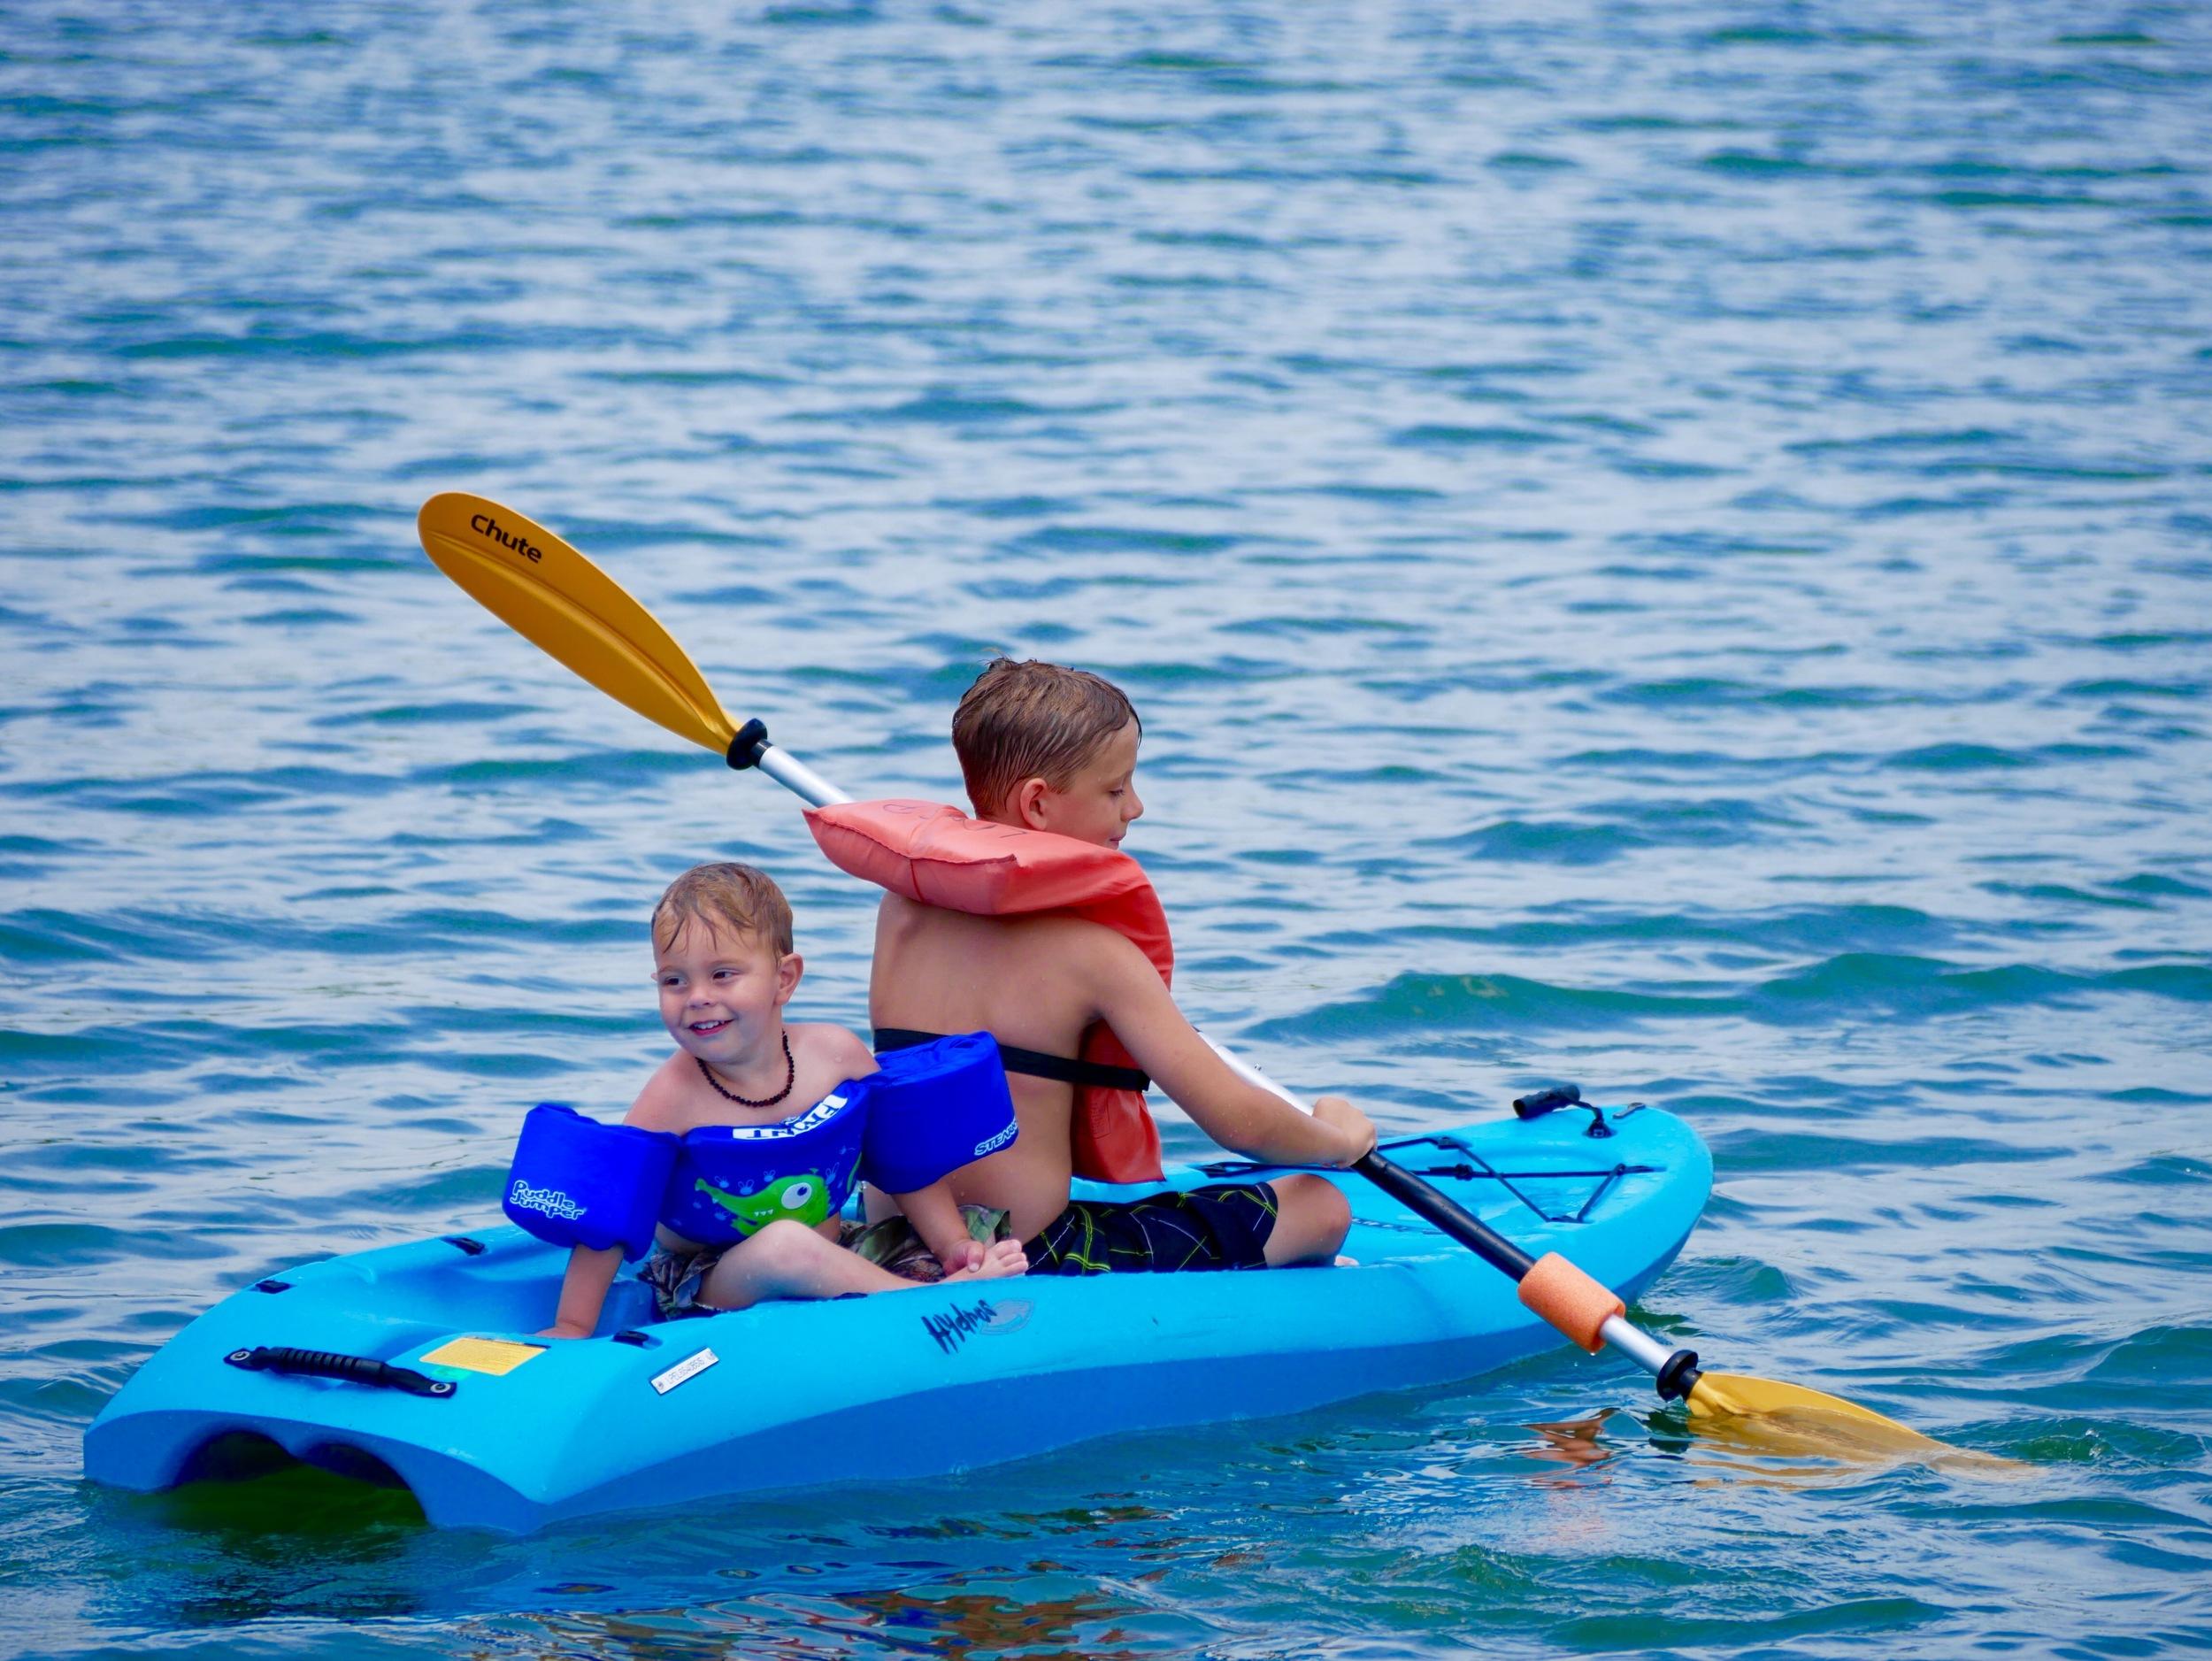 Boys learning to Kayak